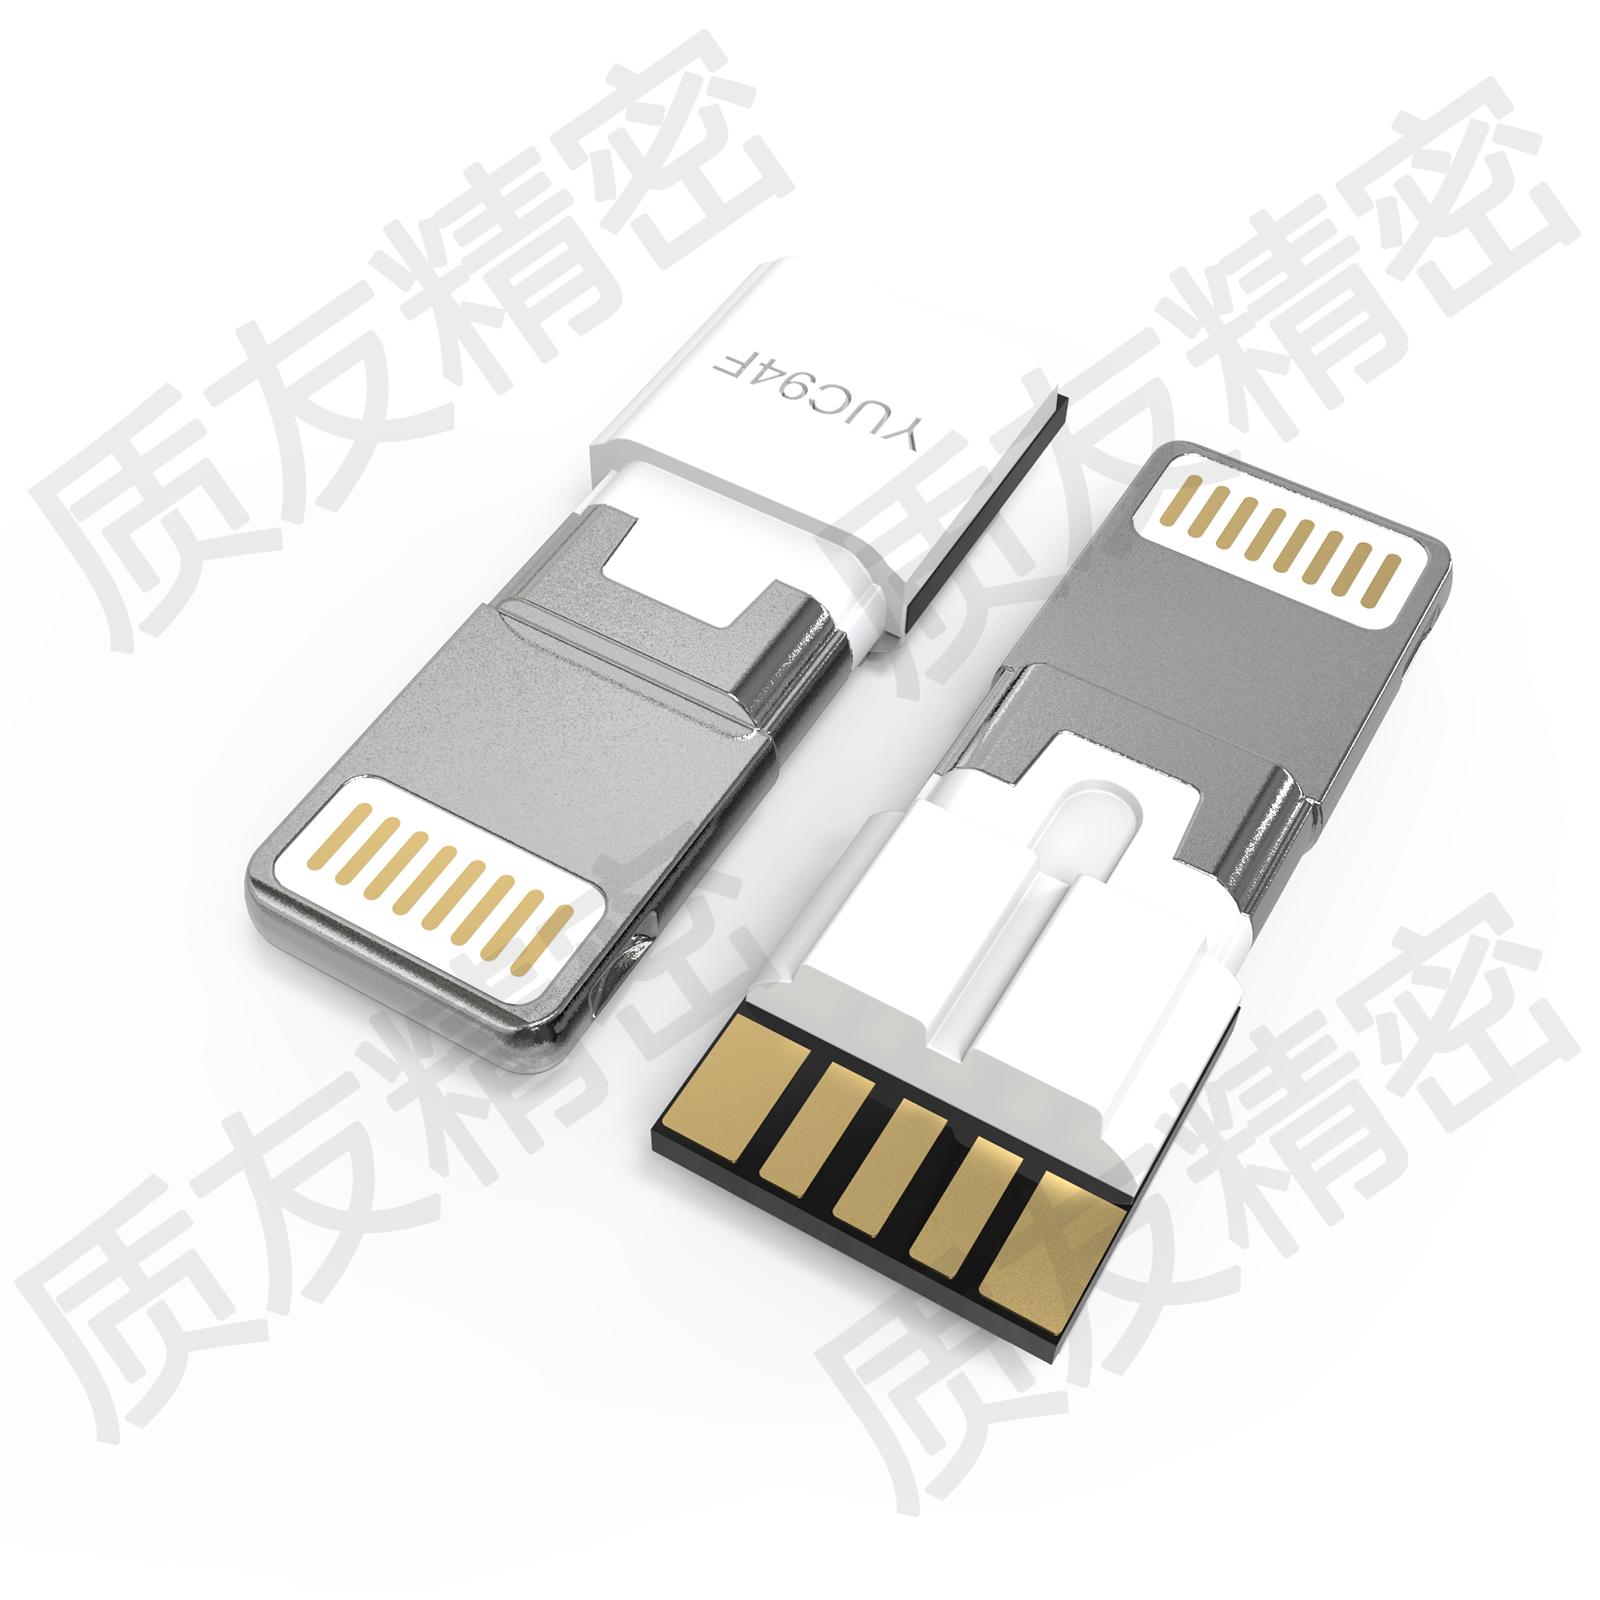 苹果8p一体PD快充插头 YUC94F 粉末冶金